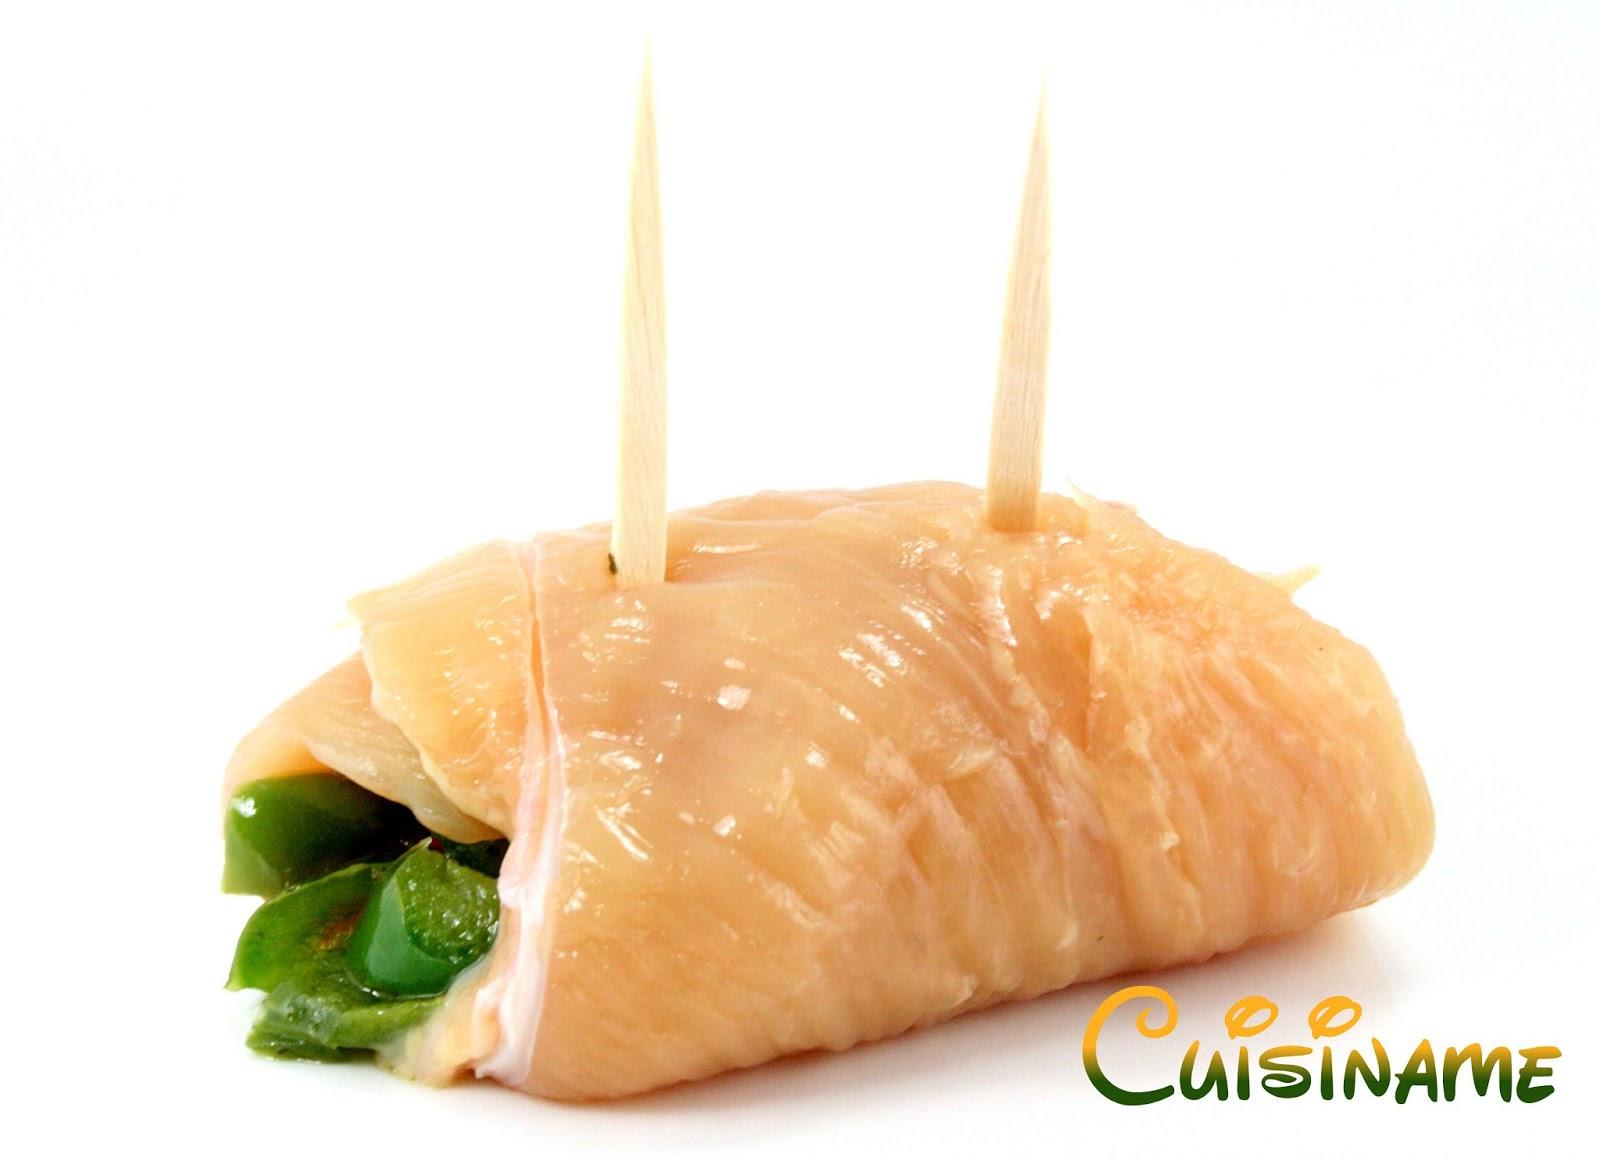 Bonito recetas de cocina con pechuga de pollo im genes for Mesa plegable bricomart